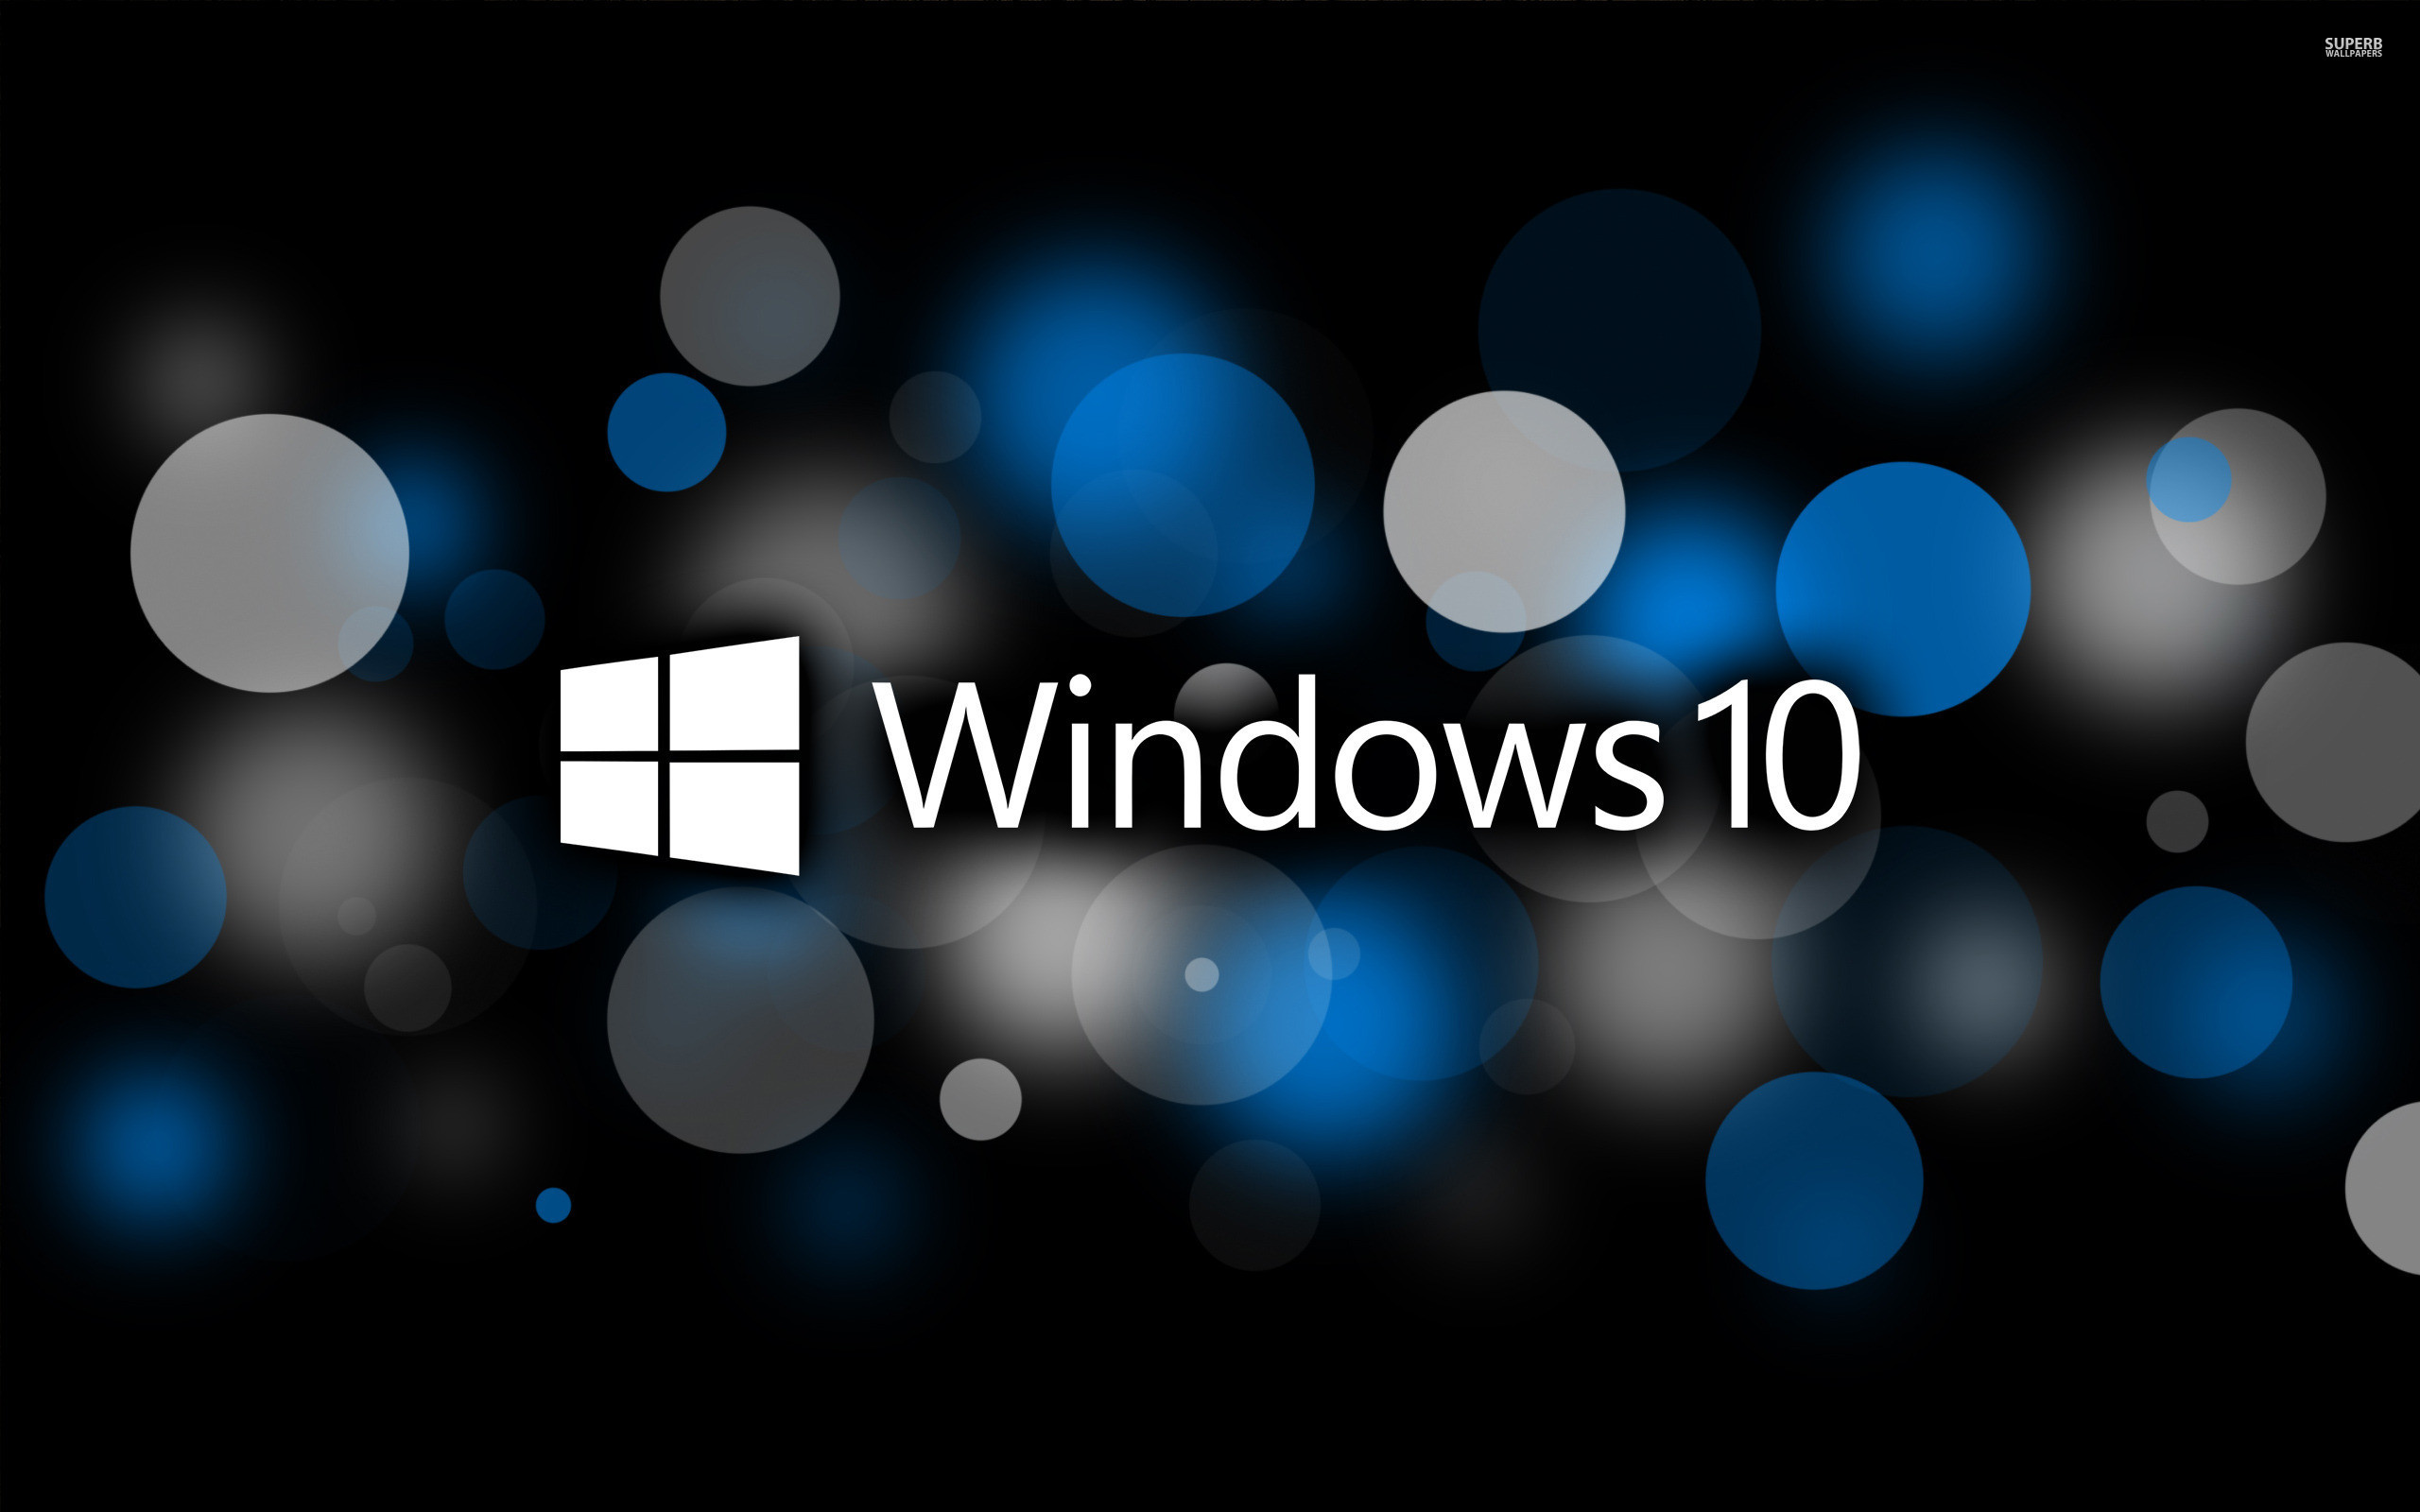 Motion Blue Windows 10 wallpaper | Windows 10 wallpapers | Pinterest | Windows  10, Wallpaper and Wallpaper windows 10